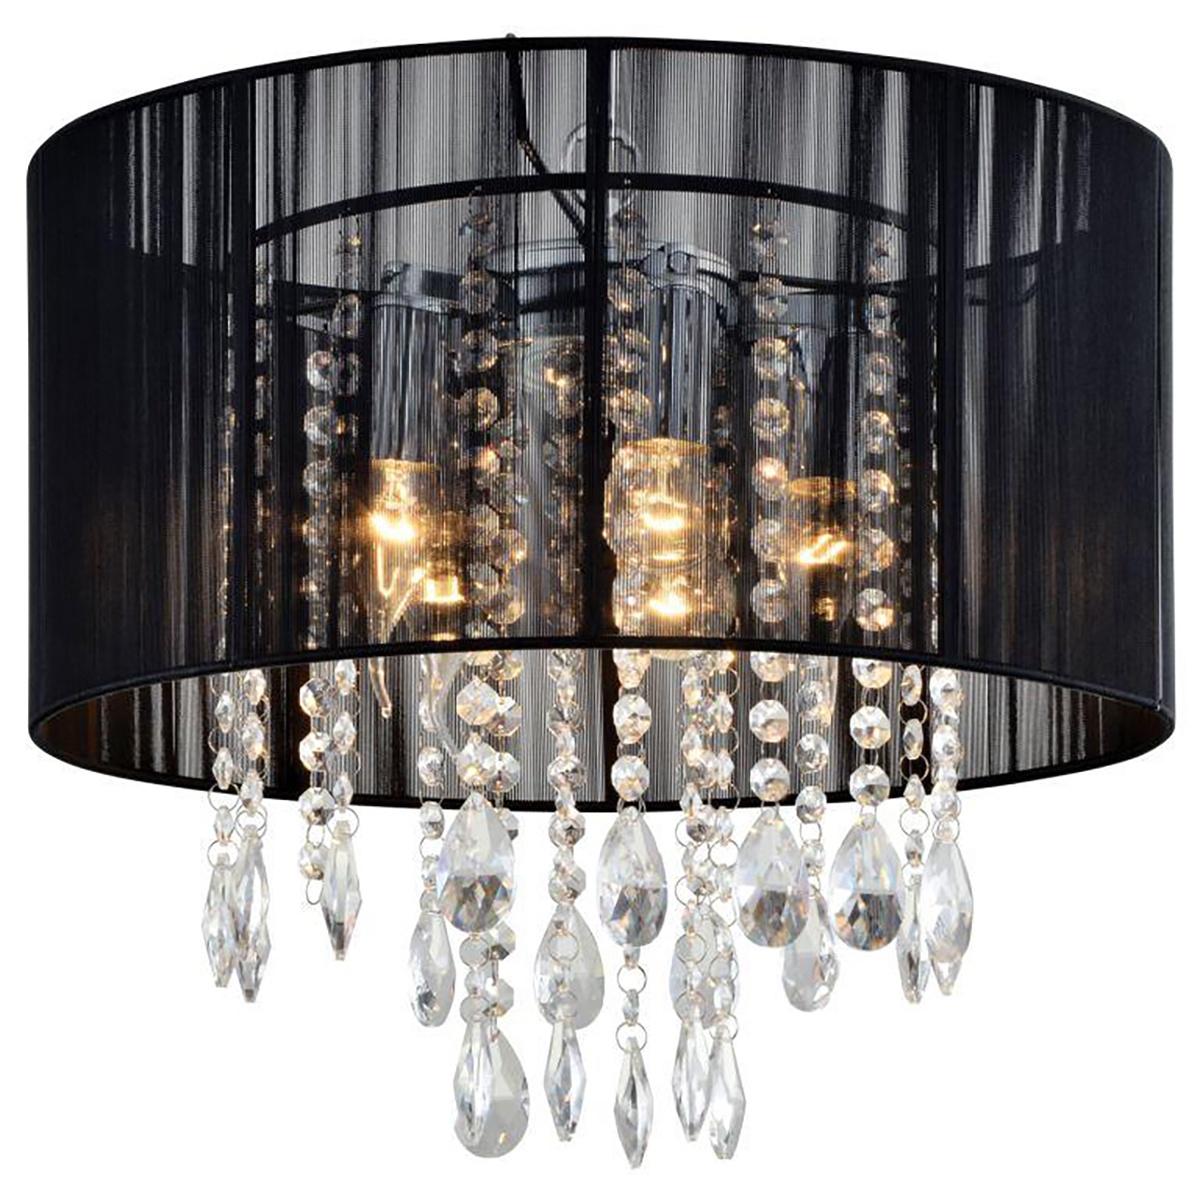 Подвесной светильник Collezioni Ely, E14, 5x60Вт Вт цены онлайн